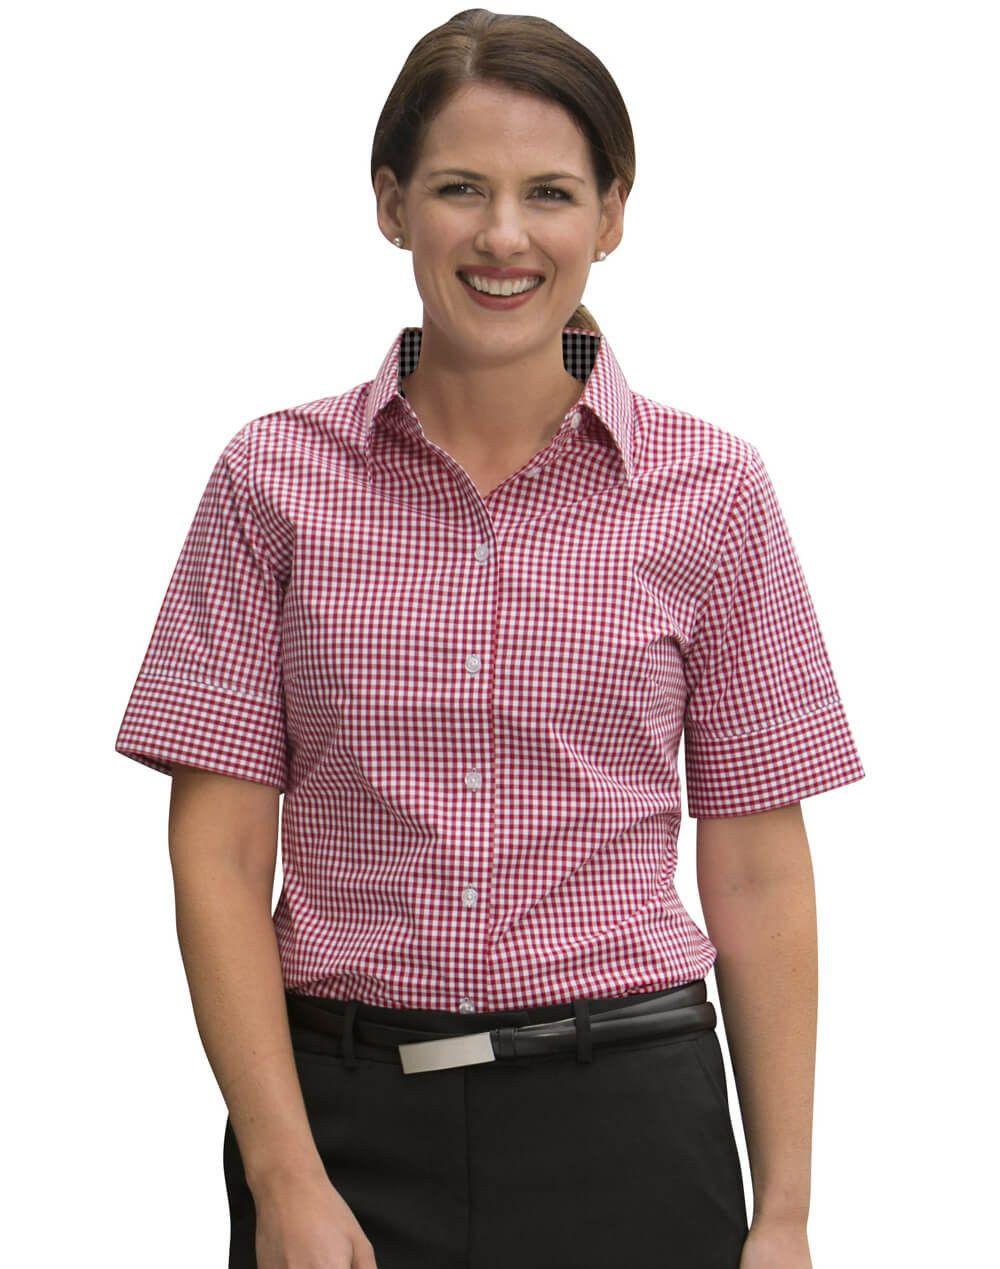 Winning Spirit Ladies' Gingham Check Short Sleeve Shirt